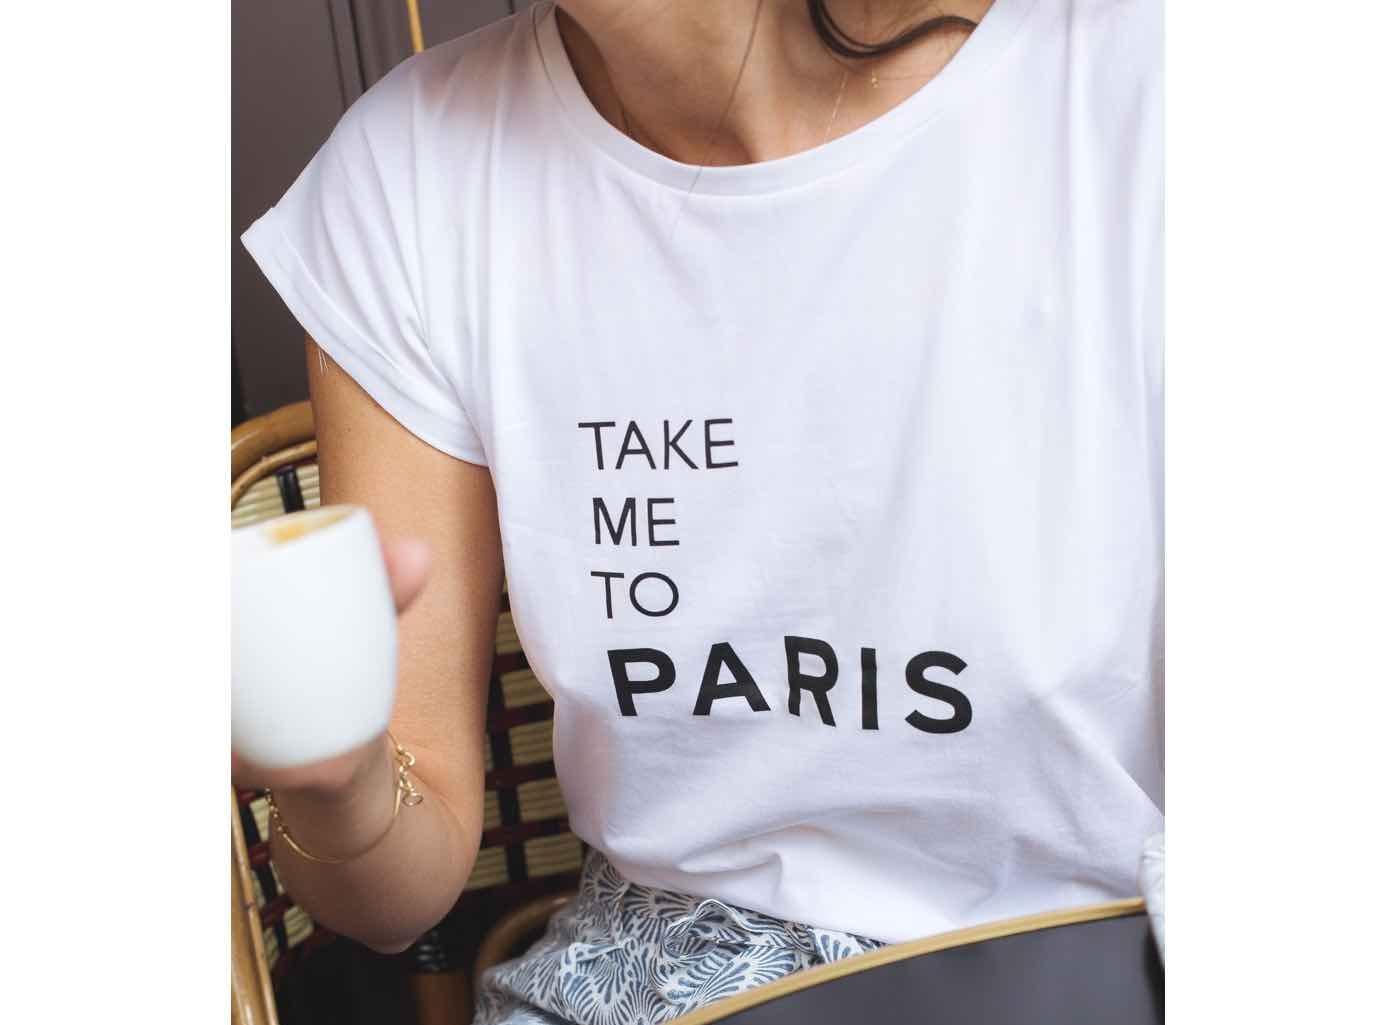 Stylodeco-la-collab-t-shirt-take-me-to-paris.2.jpg